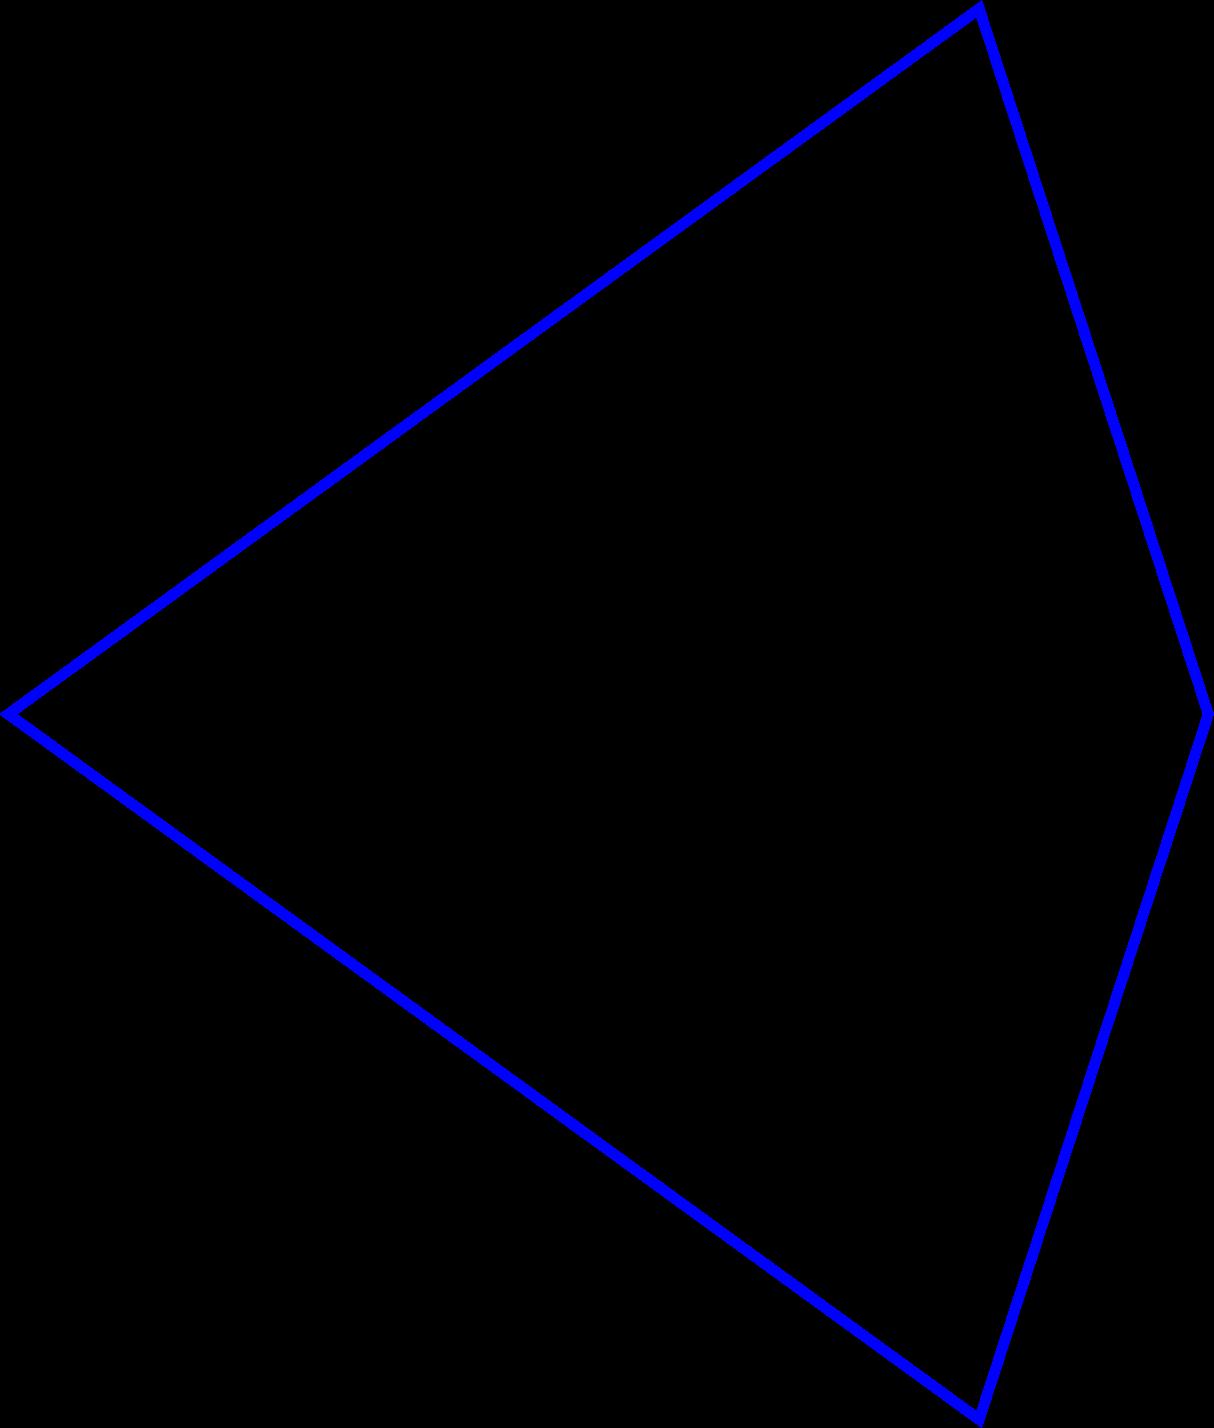 Penrose tiles big image. Kite clipart animated